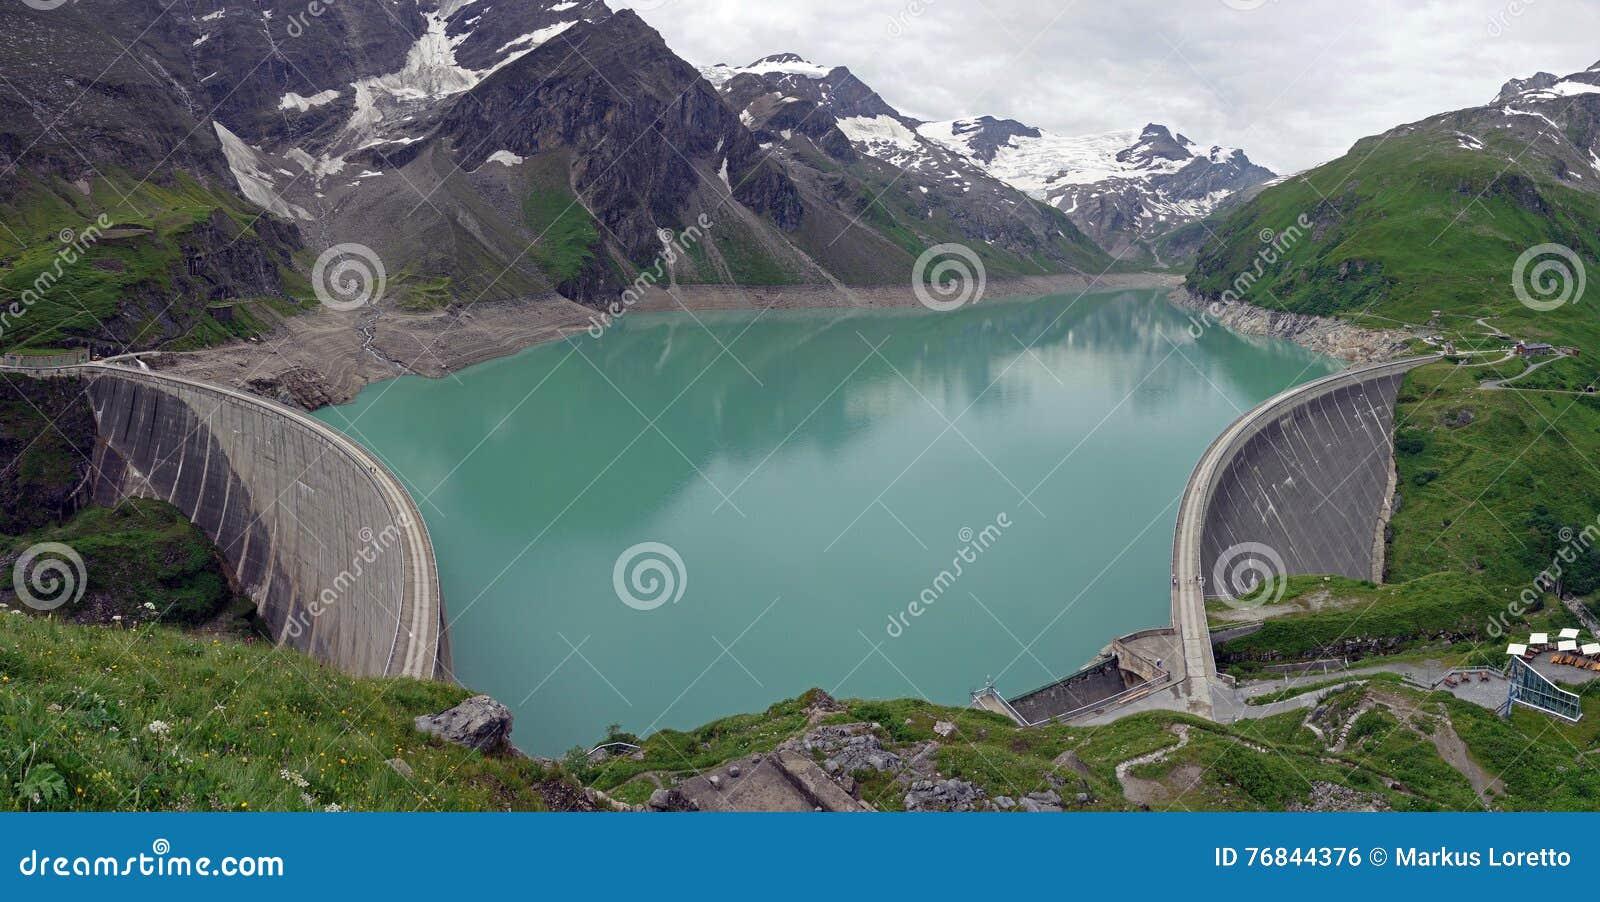 Barrage de Kaprun, lac Mooserboden